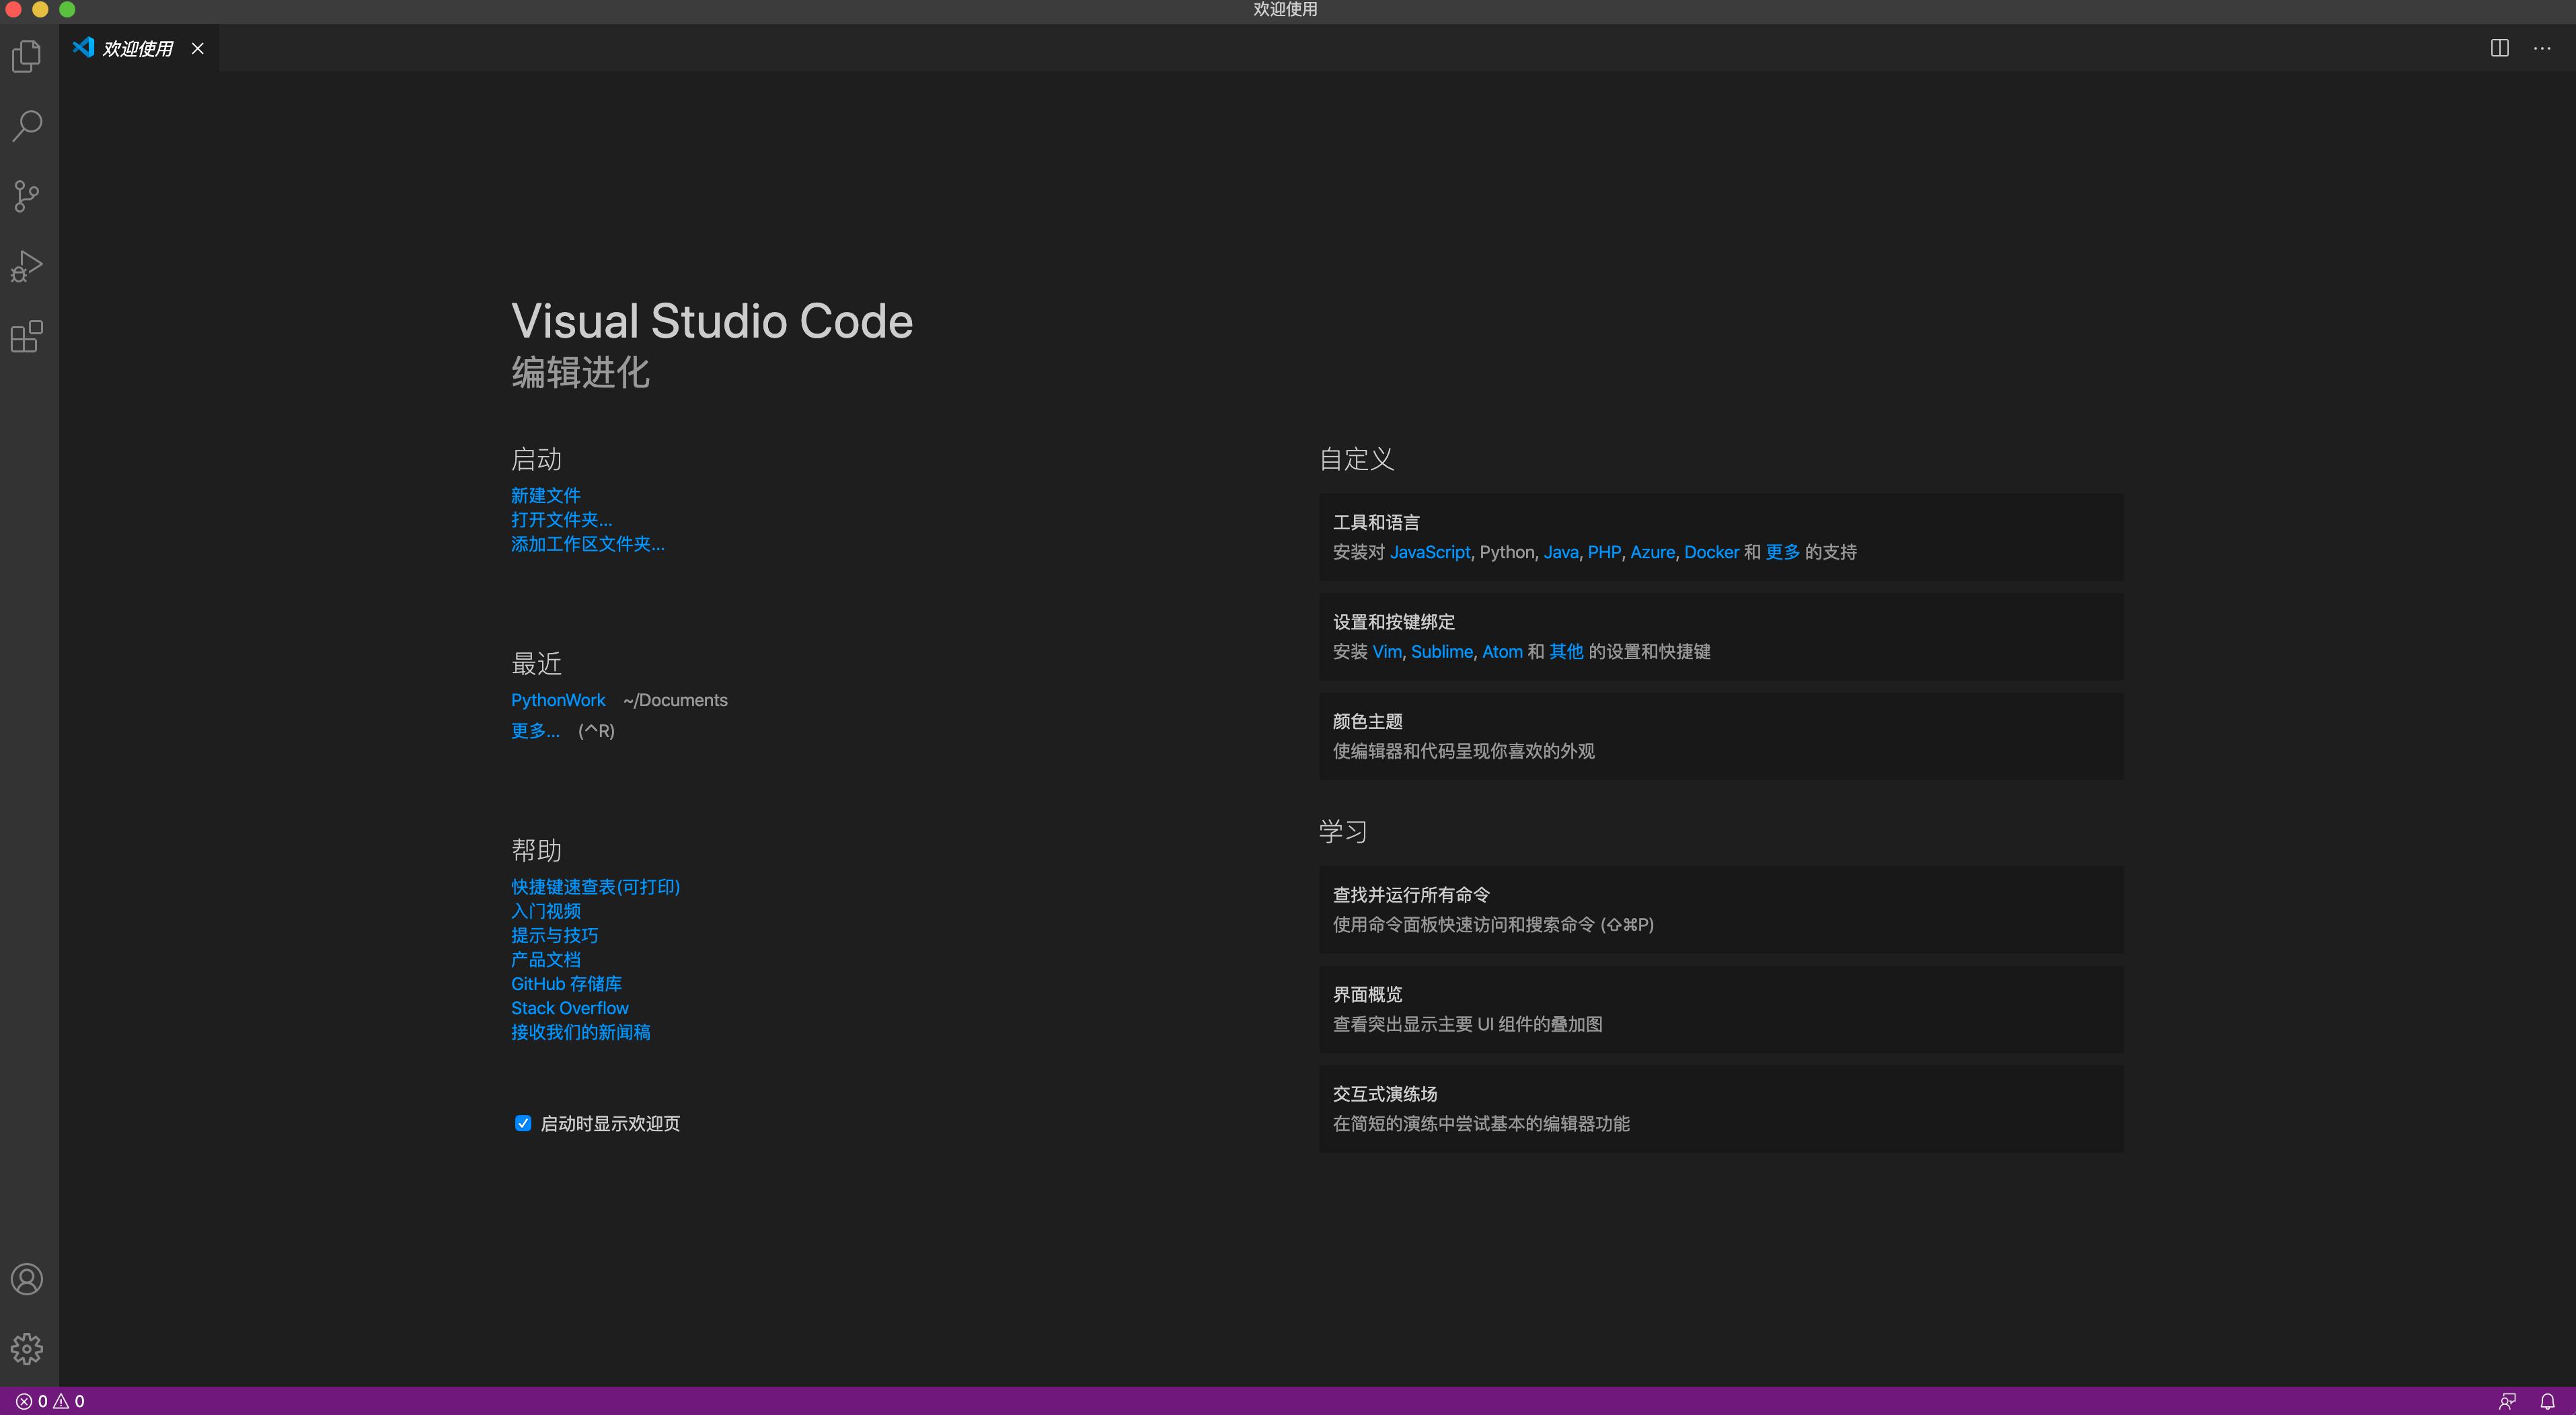 vscode中文设置后的显示界面